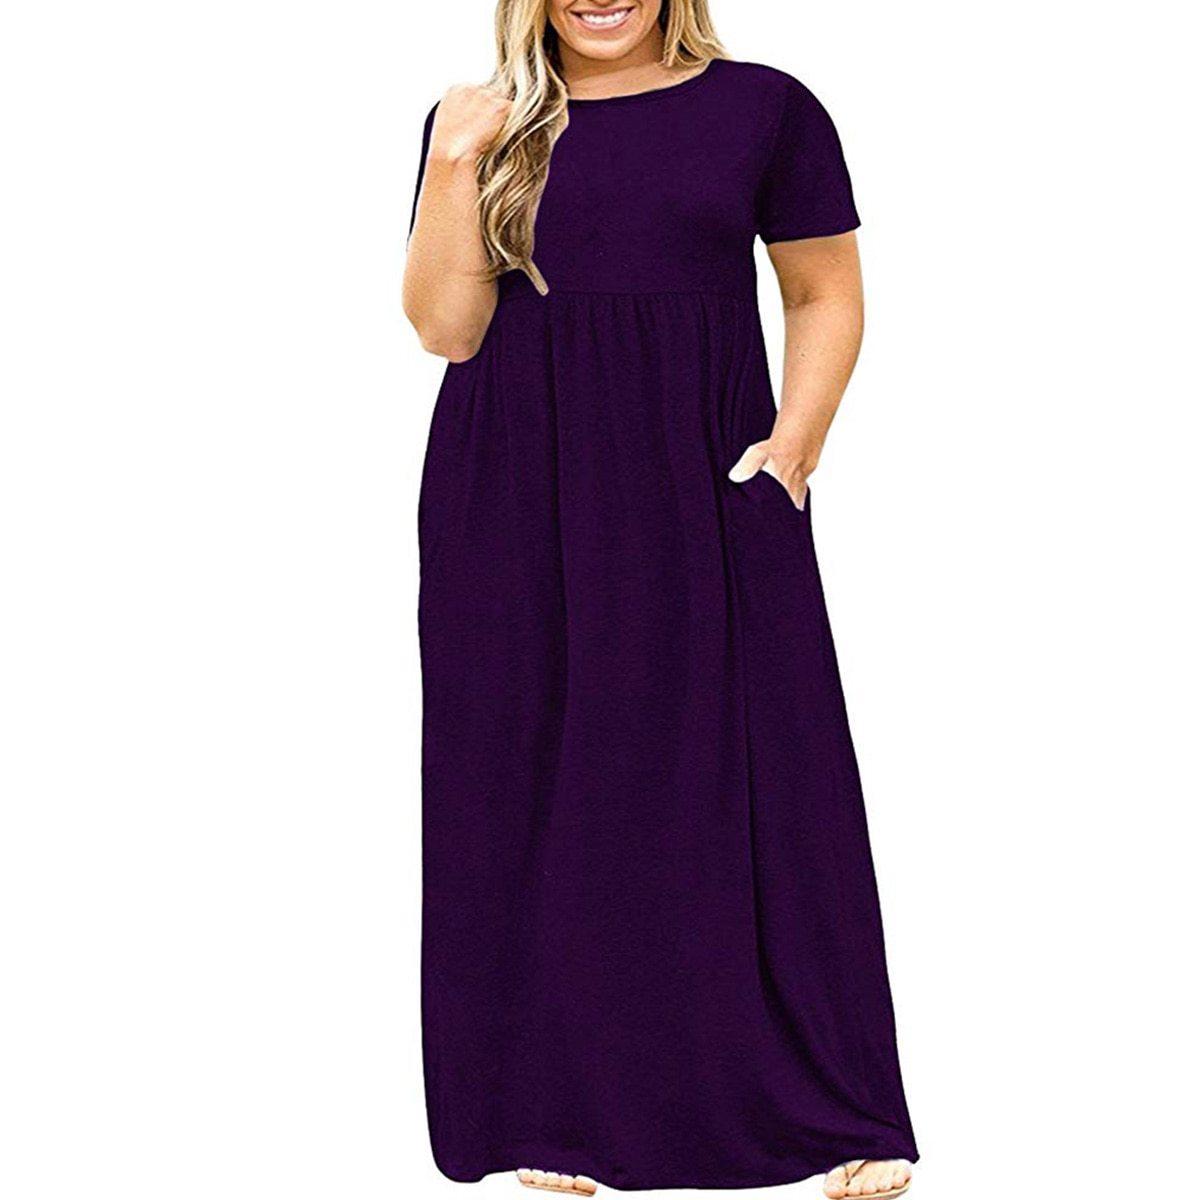 Maternity Dress Solid Color Loose Comfy Mom Dress image 3